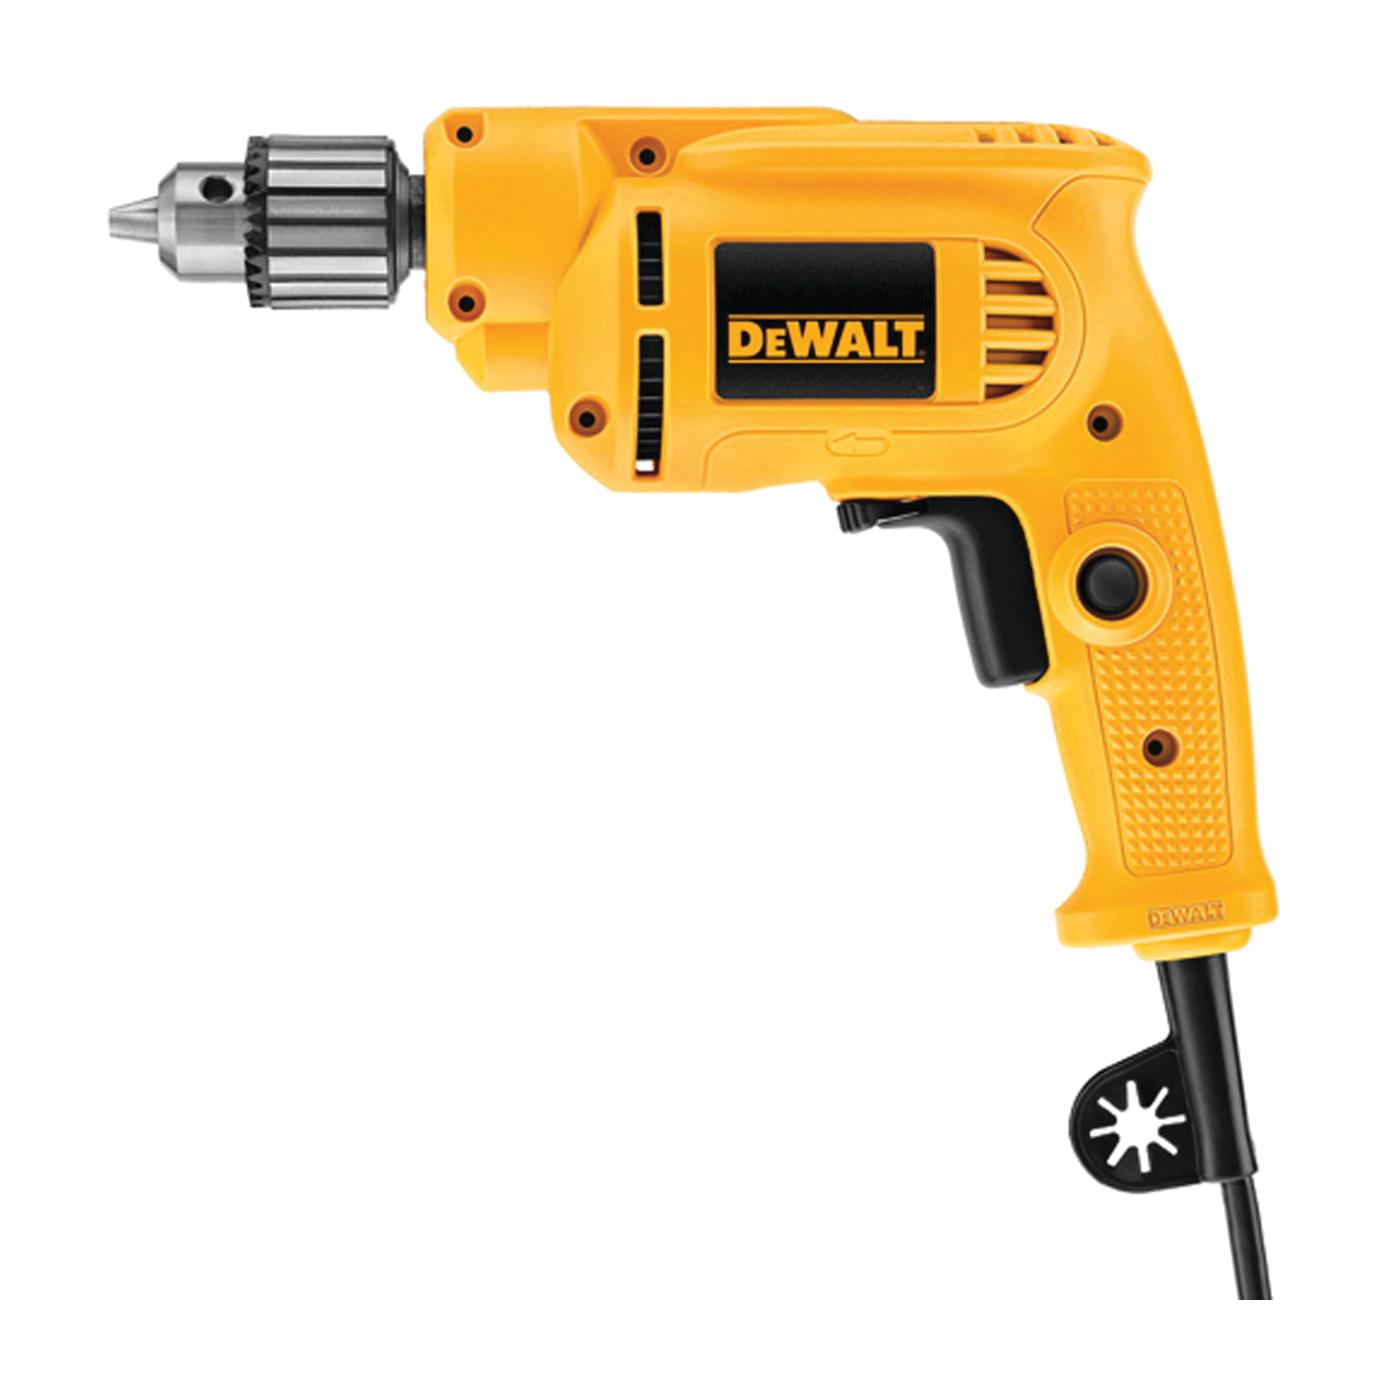 Picture of DeWALT DWE1014 Electric Drill, 120 V, 440 W, 1 in Spade Bit, 1-1/8 in Hole Saw Bit, 3/8 in Twist Bit Drilling